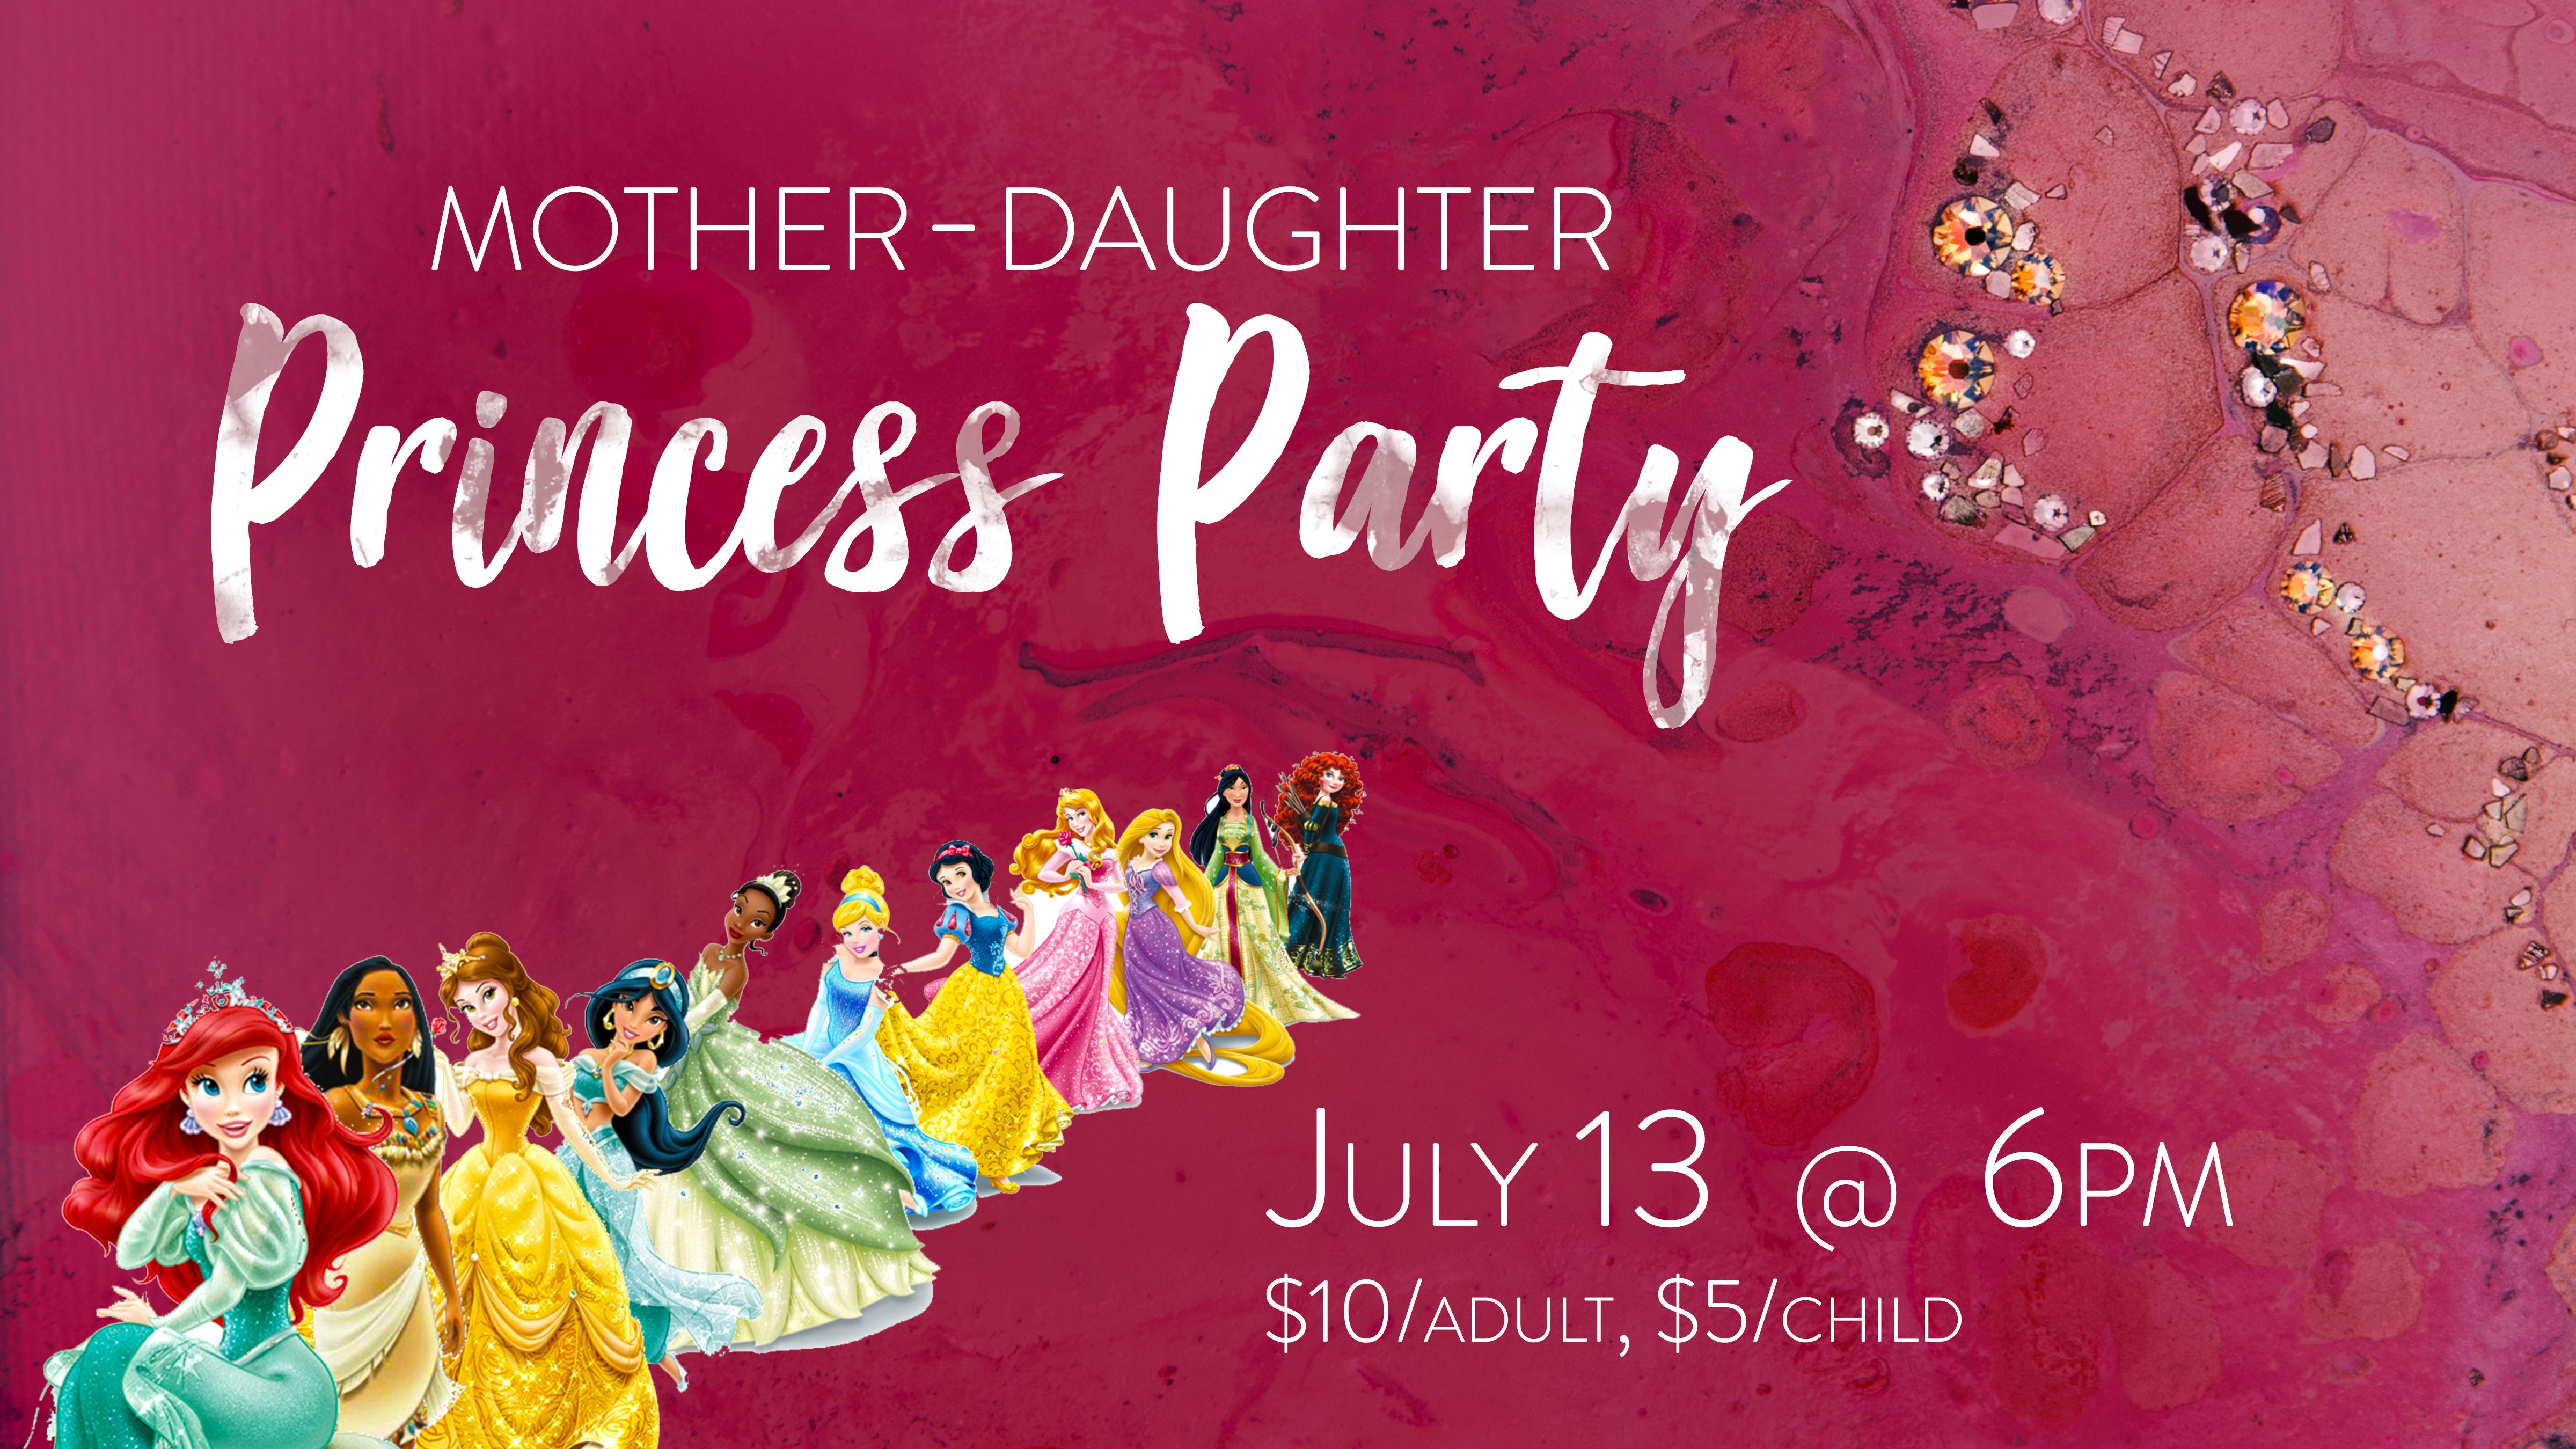 Mother daughter princess party 2018